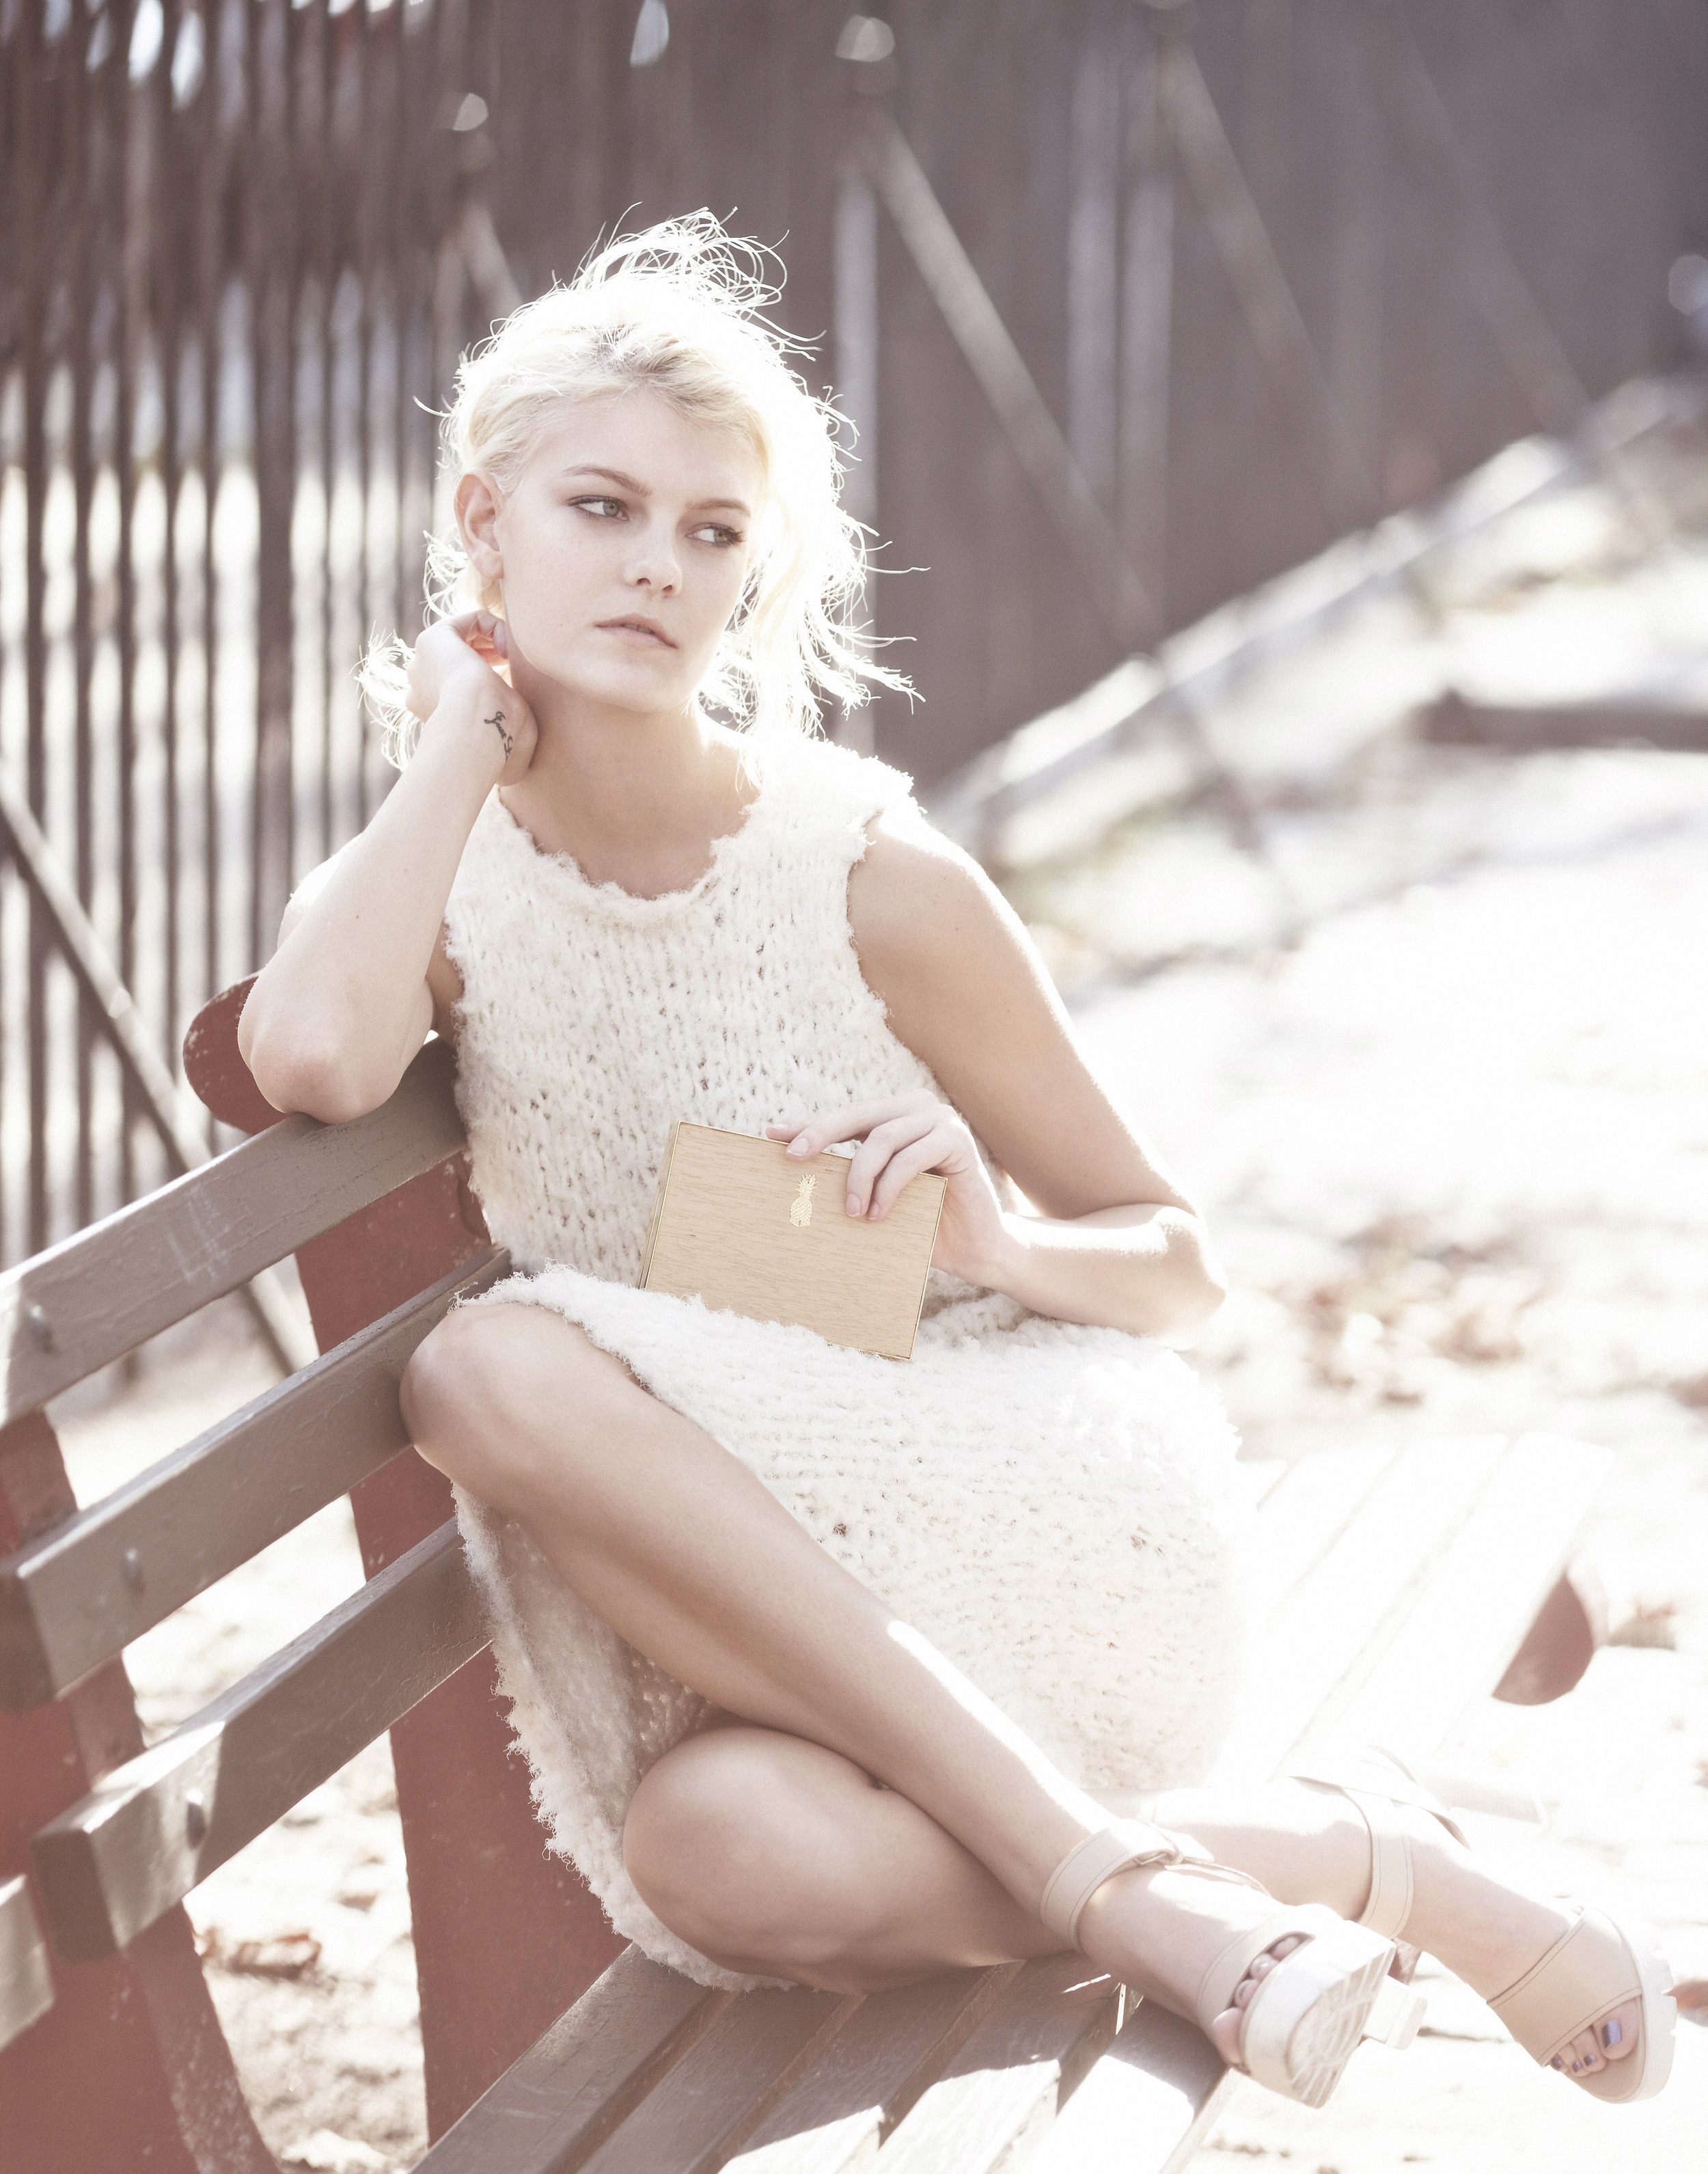 Sarah Fraser     (Wilhelmina)  wears a dress and clutch by Osklen and sandals by Zara.